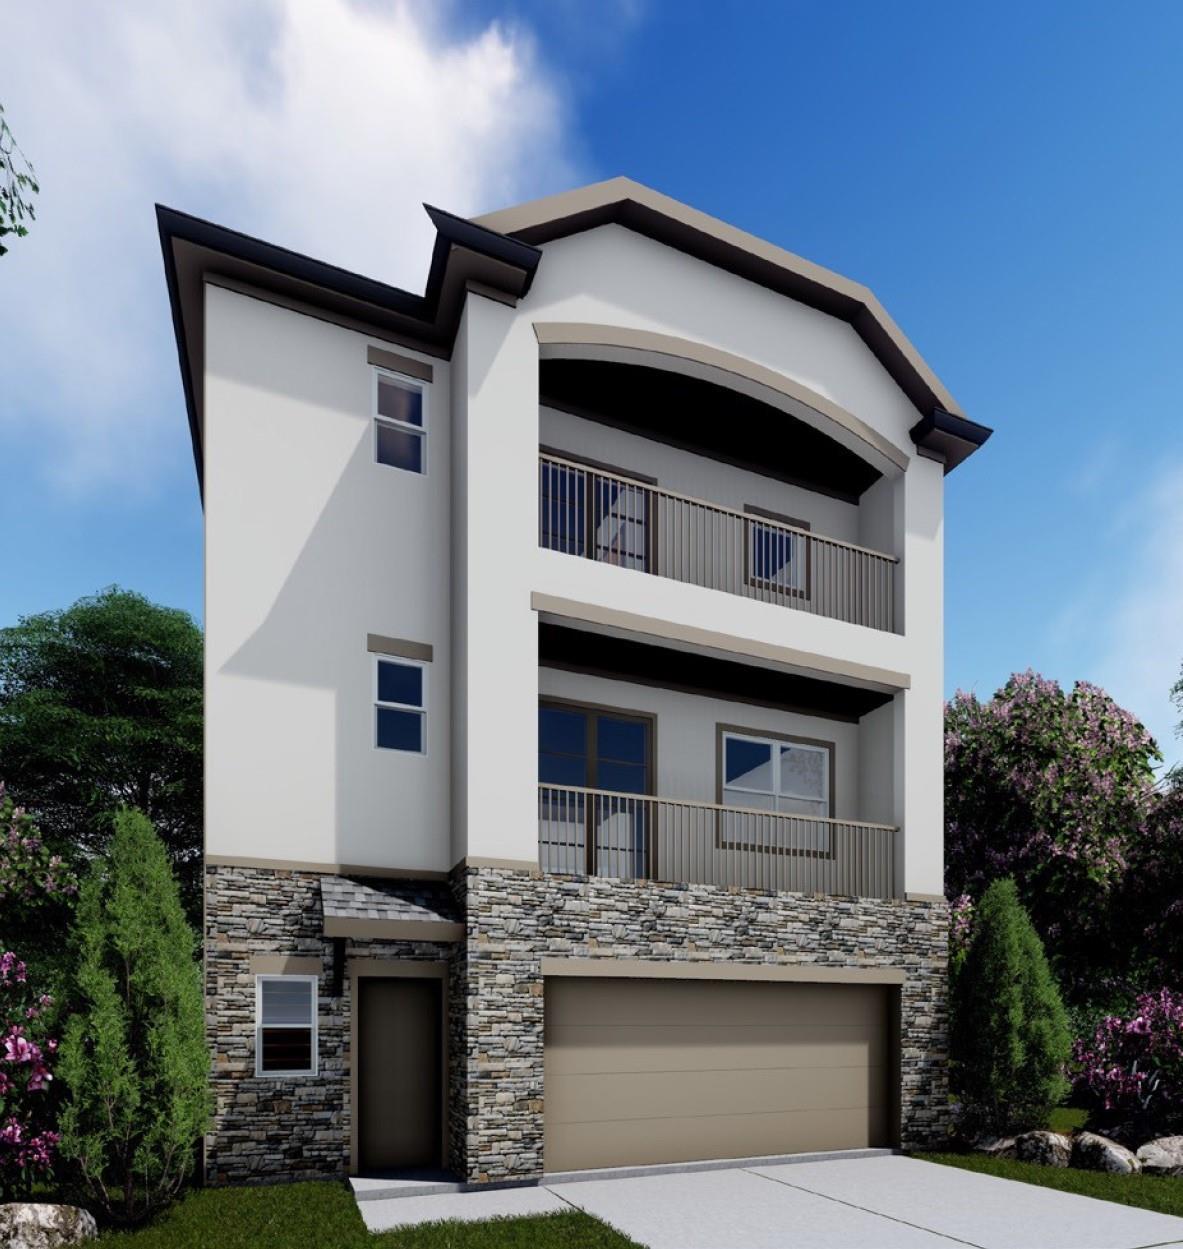 1436 W 34th 1/2 Street Property Photo - Houston, TX real estate listing